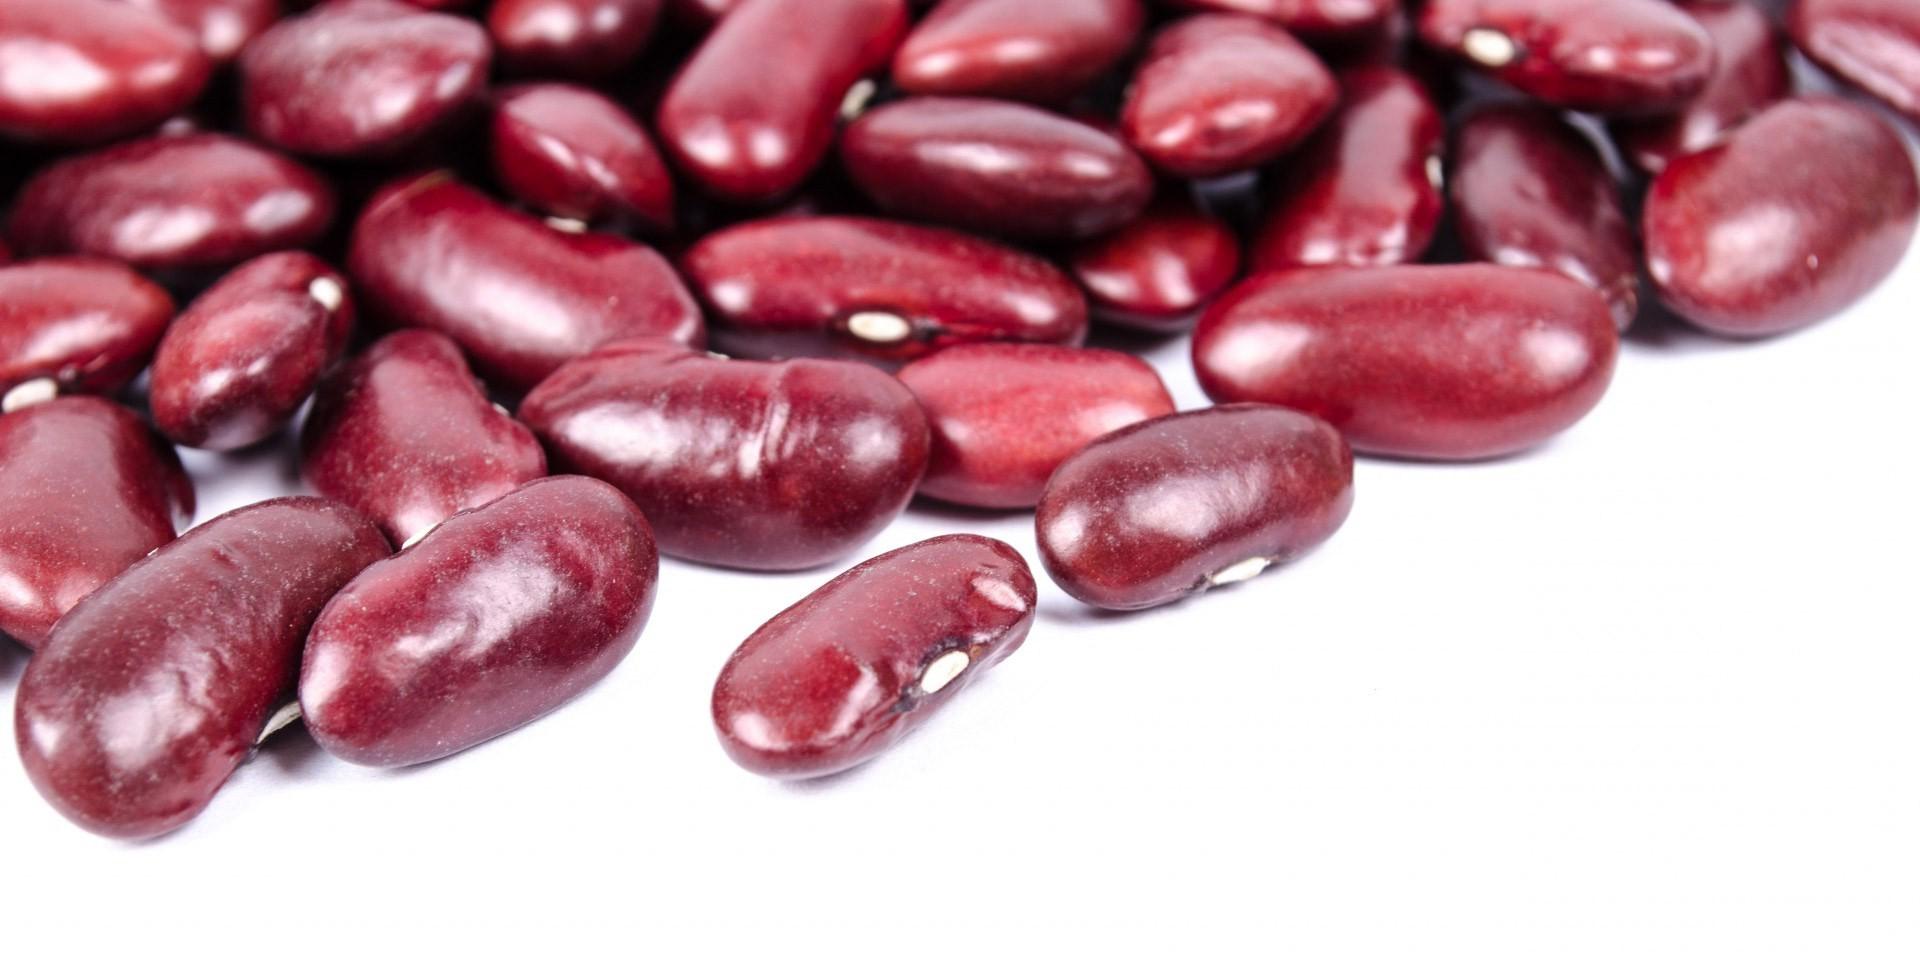 beans beans beans